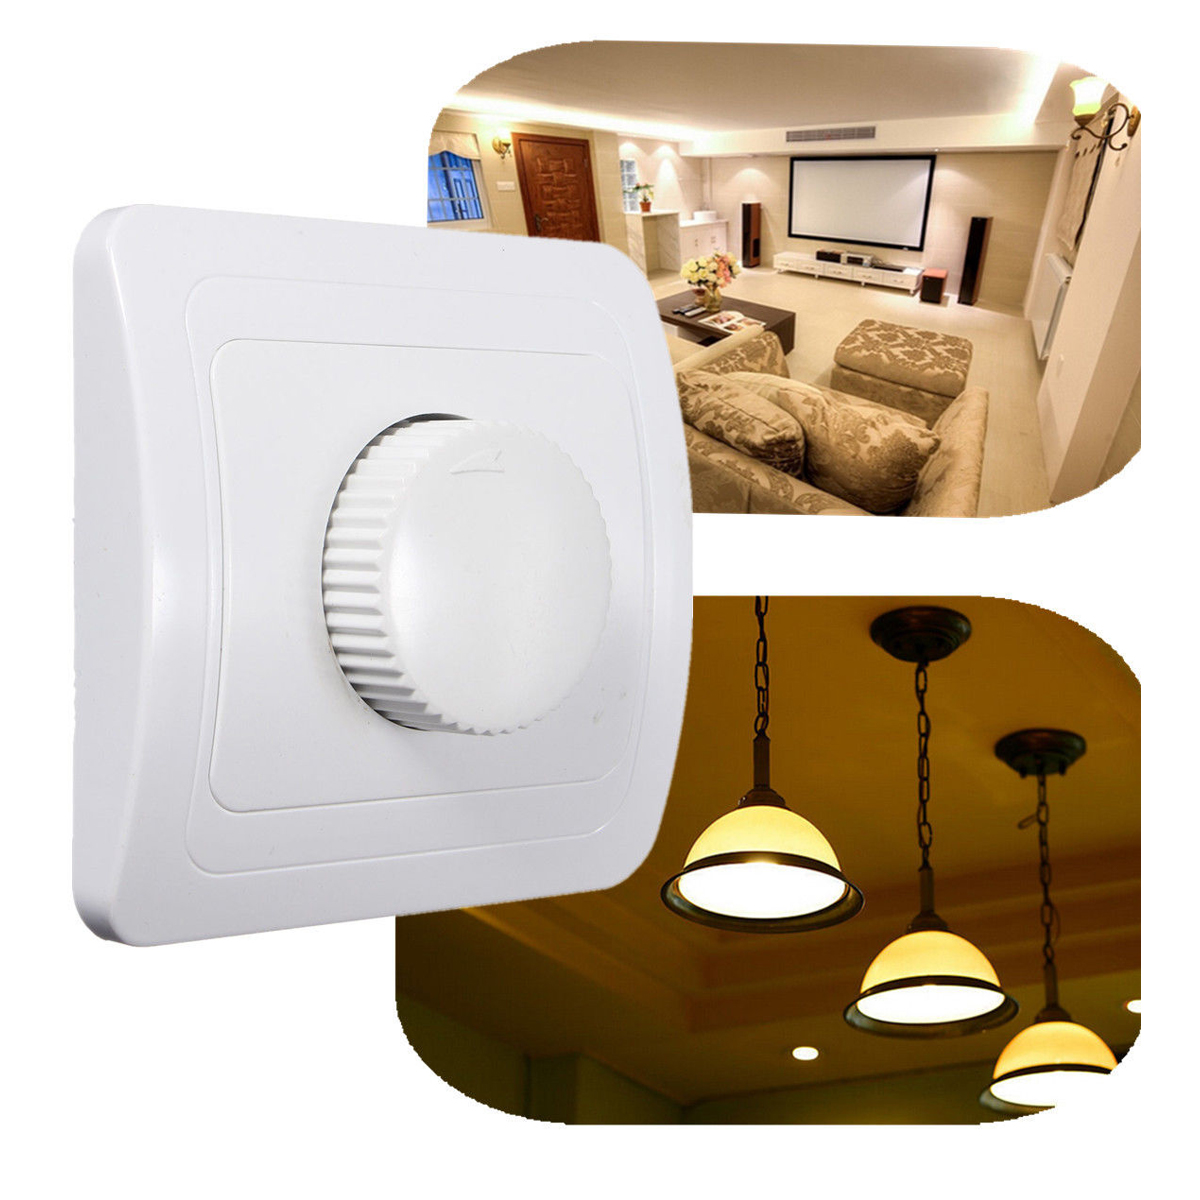 110V / 220V Adjustable Controller Dimmer Switch For Dimmable Light Bulb Lamp White bedroom silver tone knob adjustable light controller dimmer switch